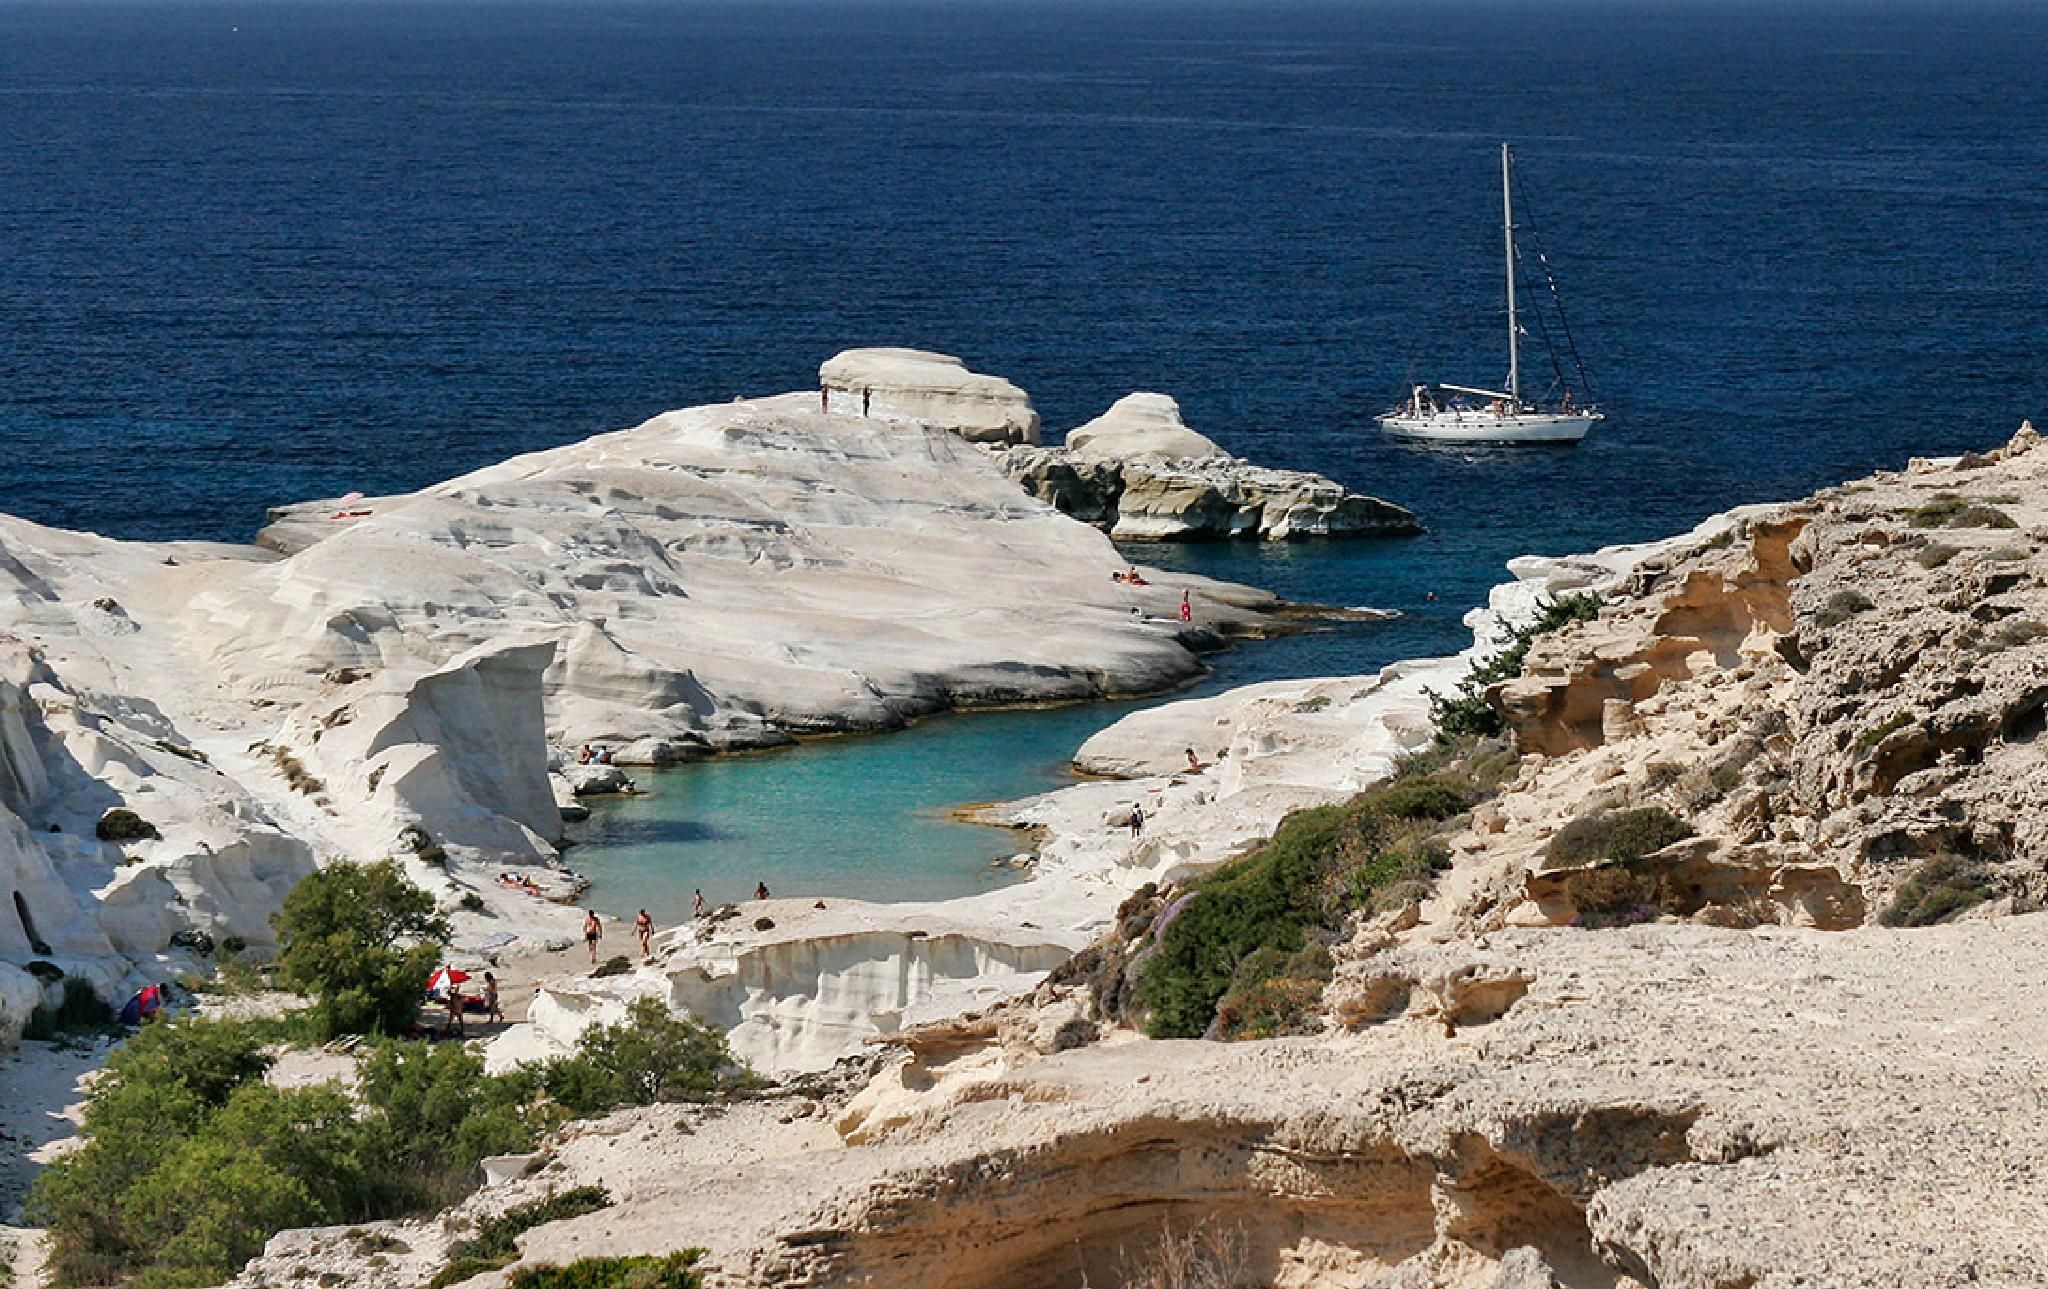 Sarakiniko,Milos island by Sotiris Siomis